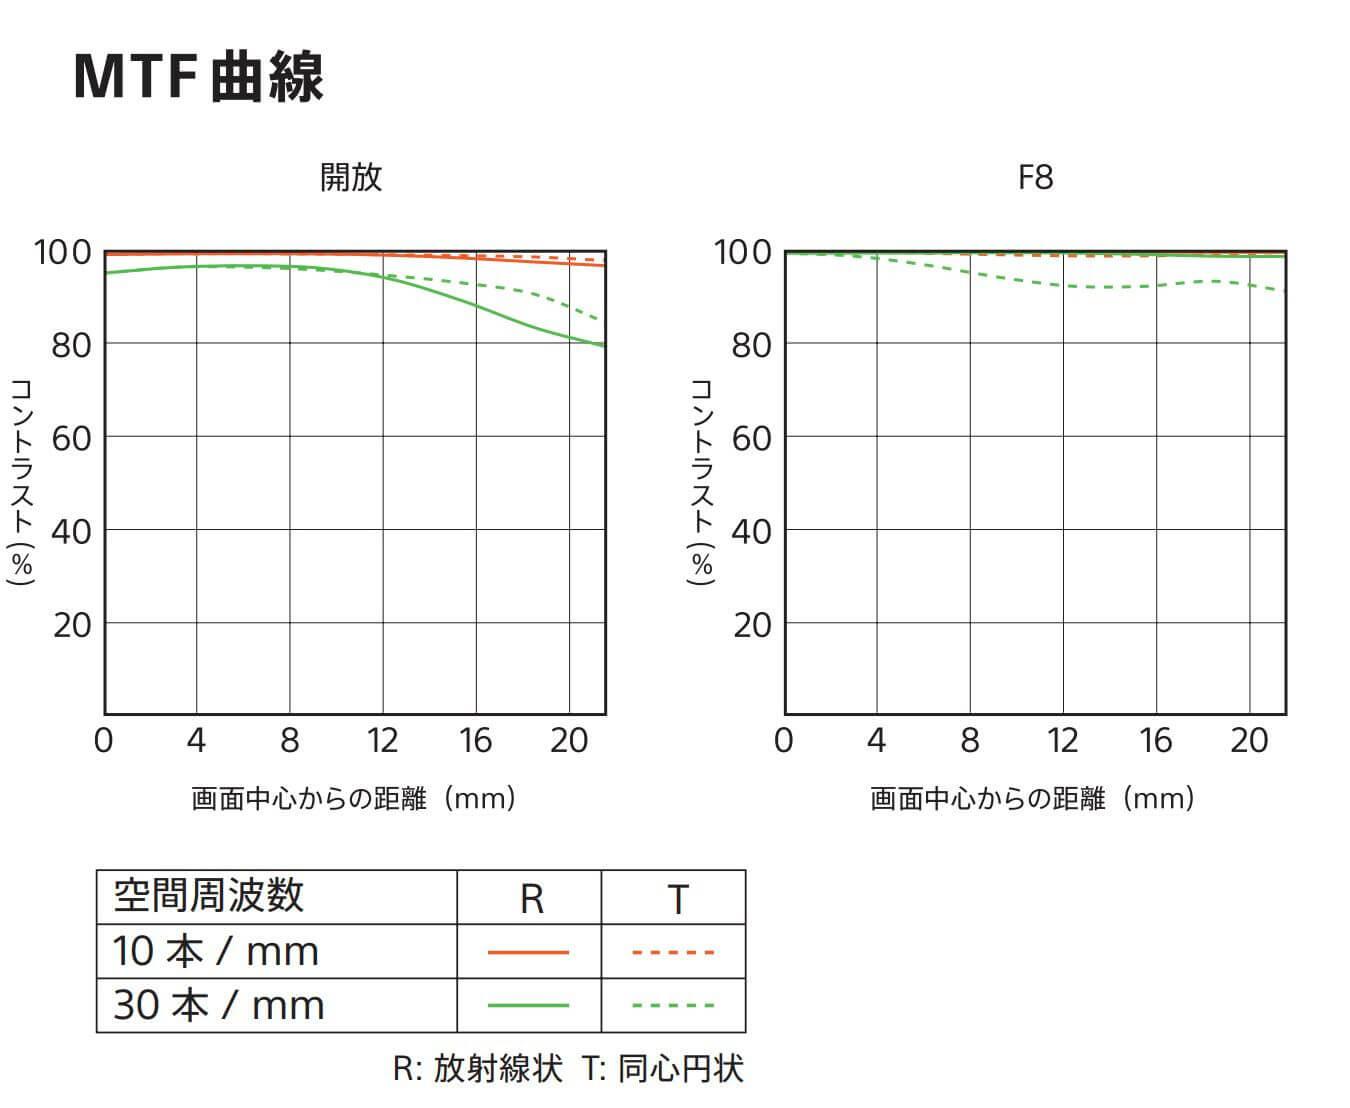 SONY 135mm F1.8のMTF曲線